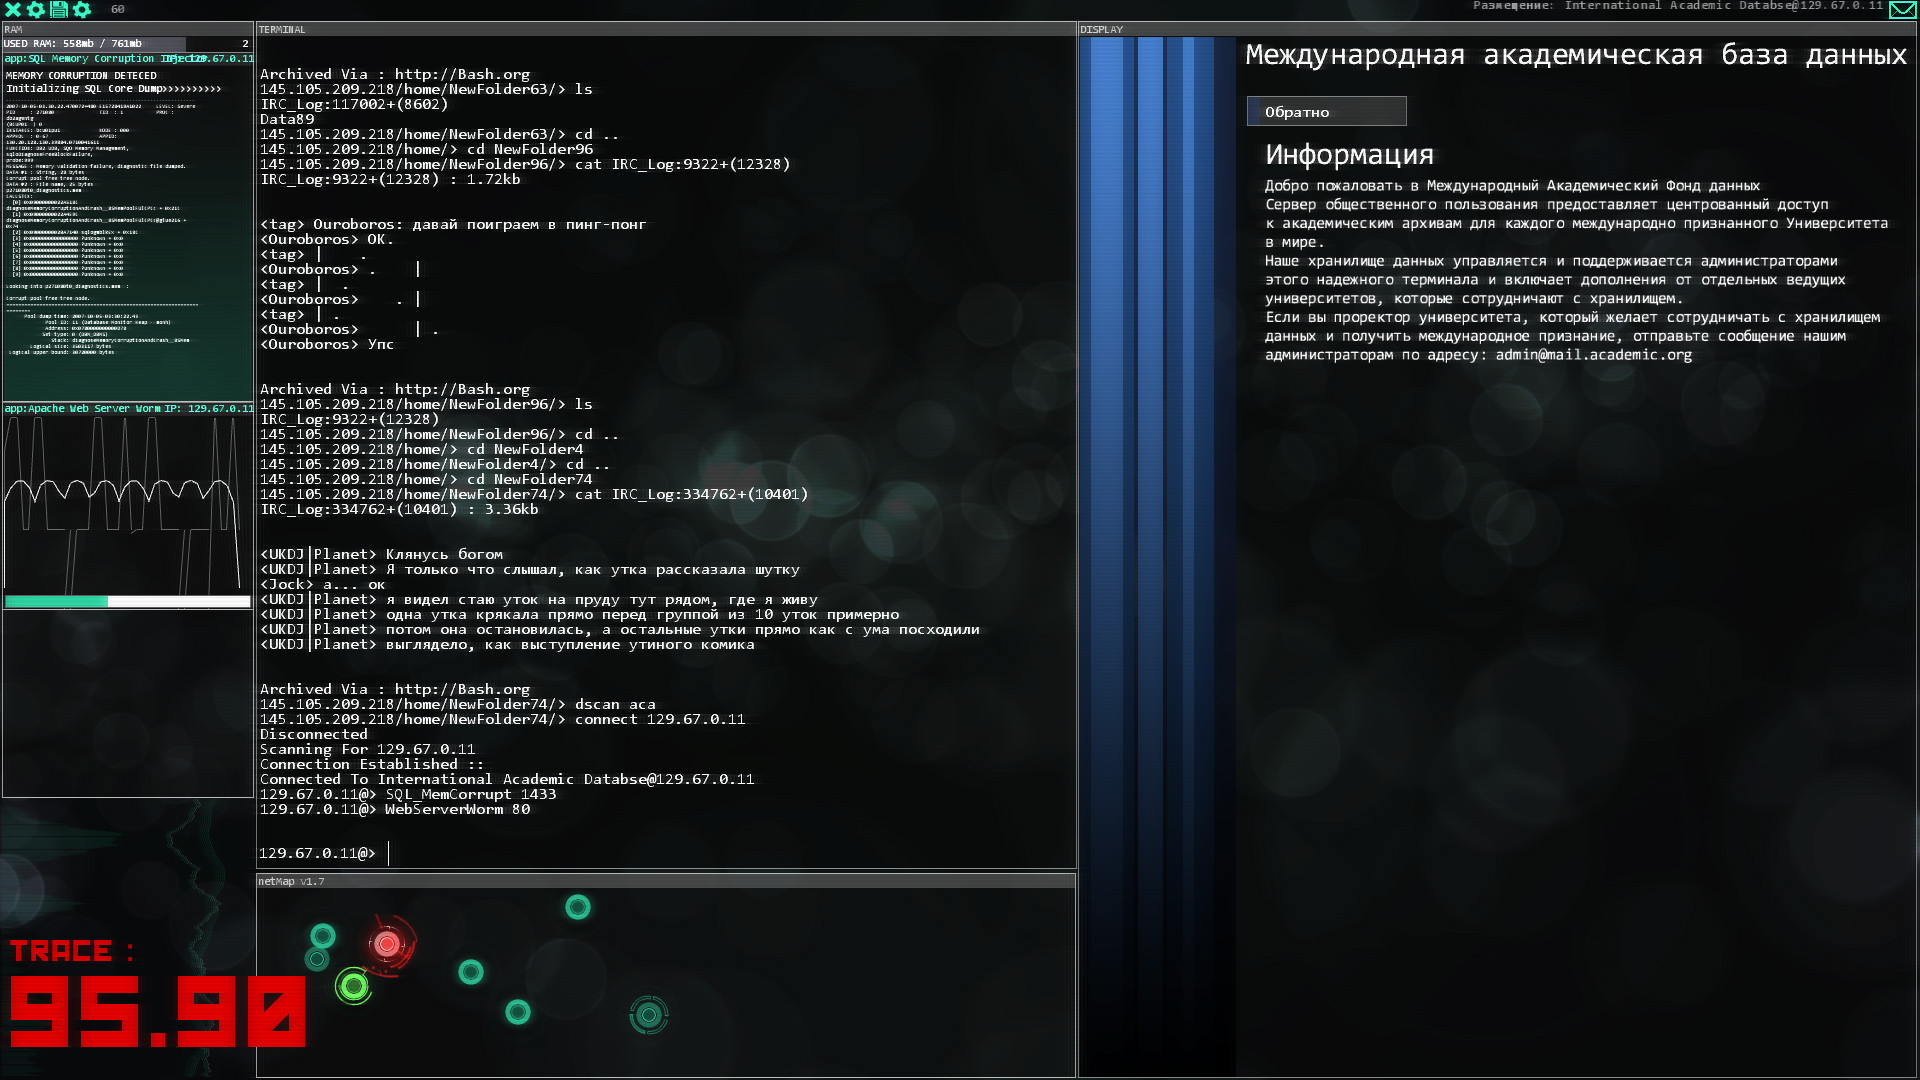 Hacknet screenshot 2